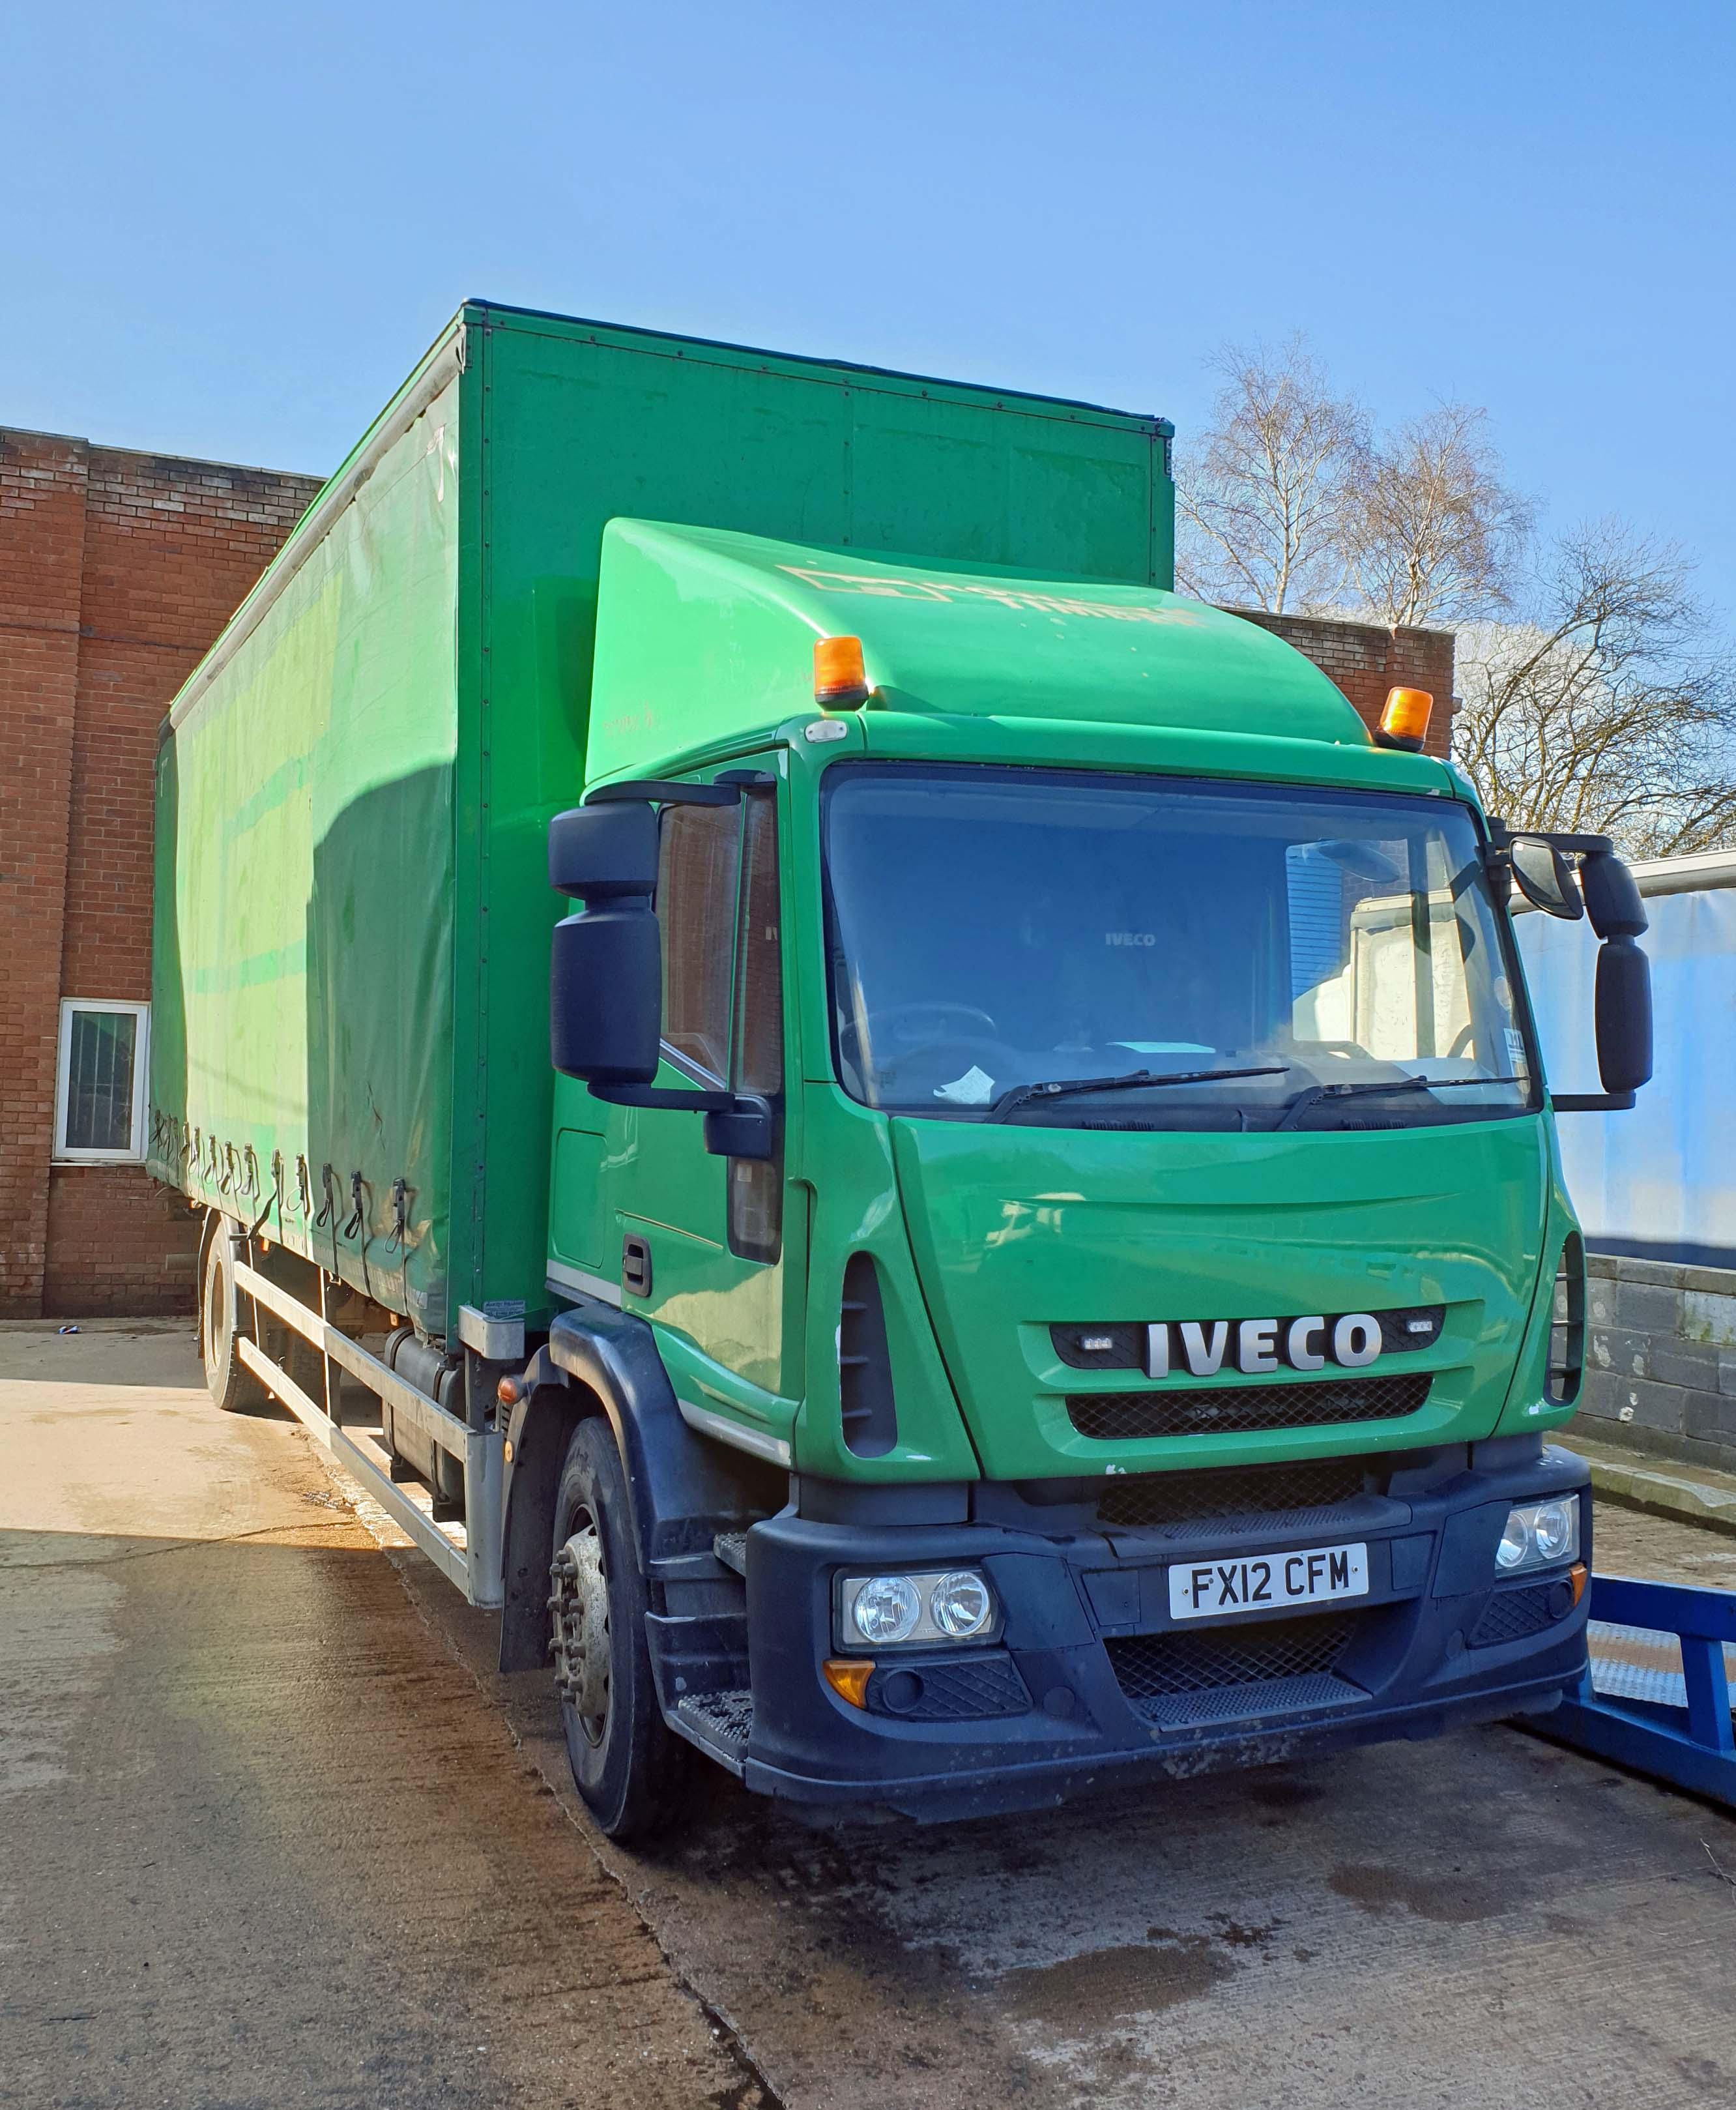 An IVECO Eurocargo ML180E25 5880cc Euro5 18-Tonne 4x2 Curtainside Truck, Registration No. FX12